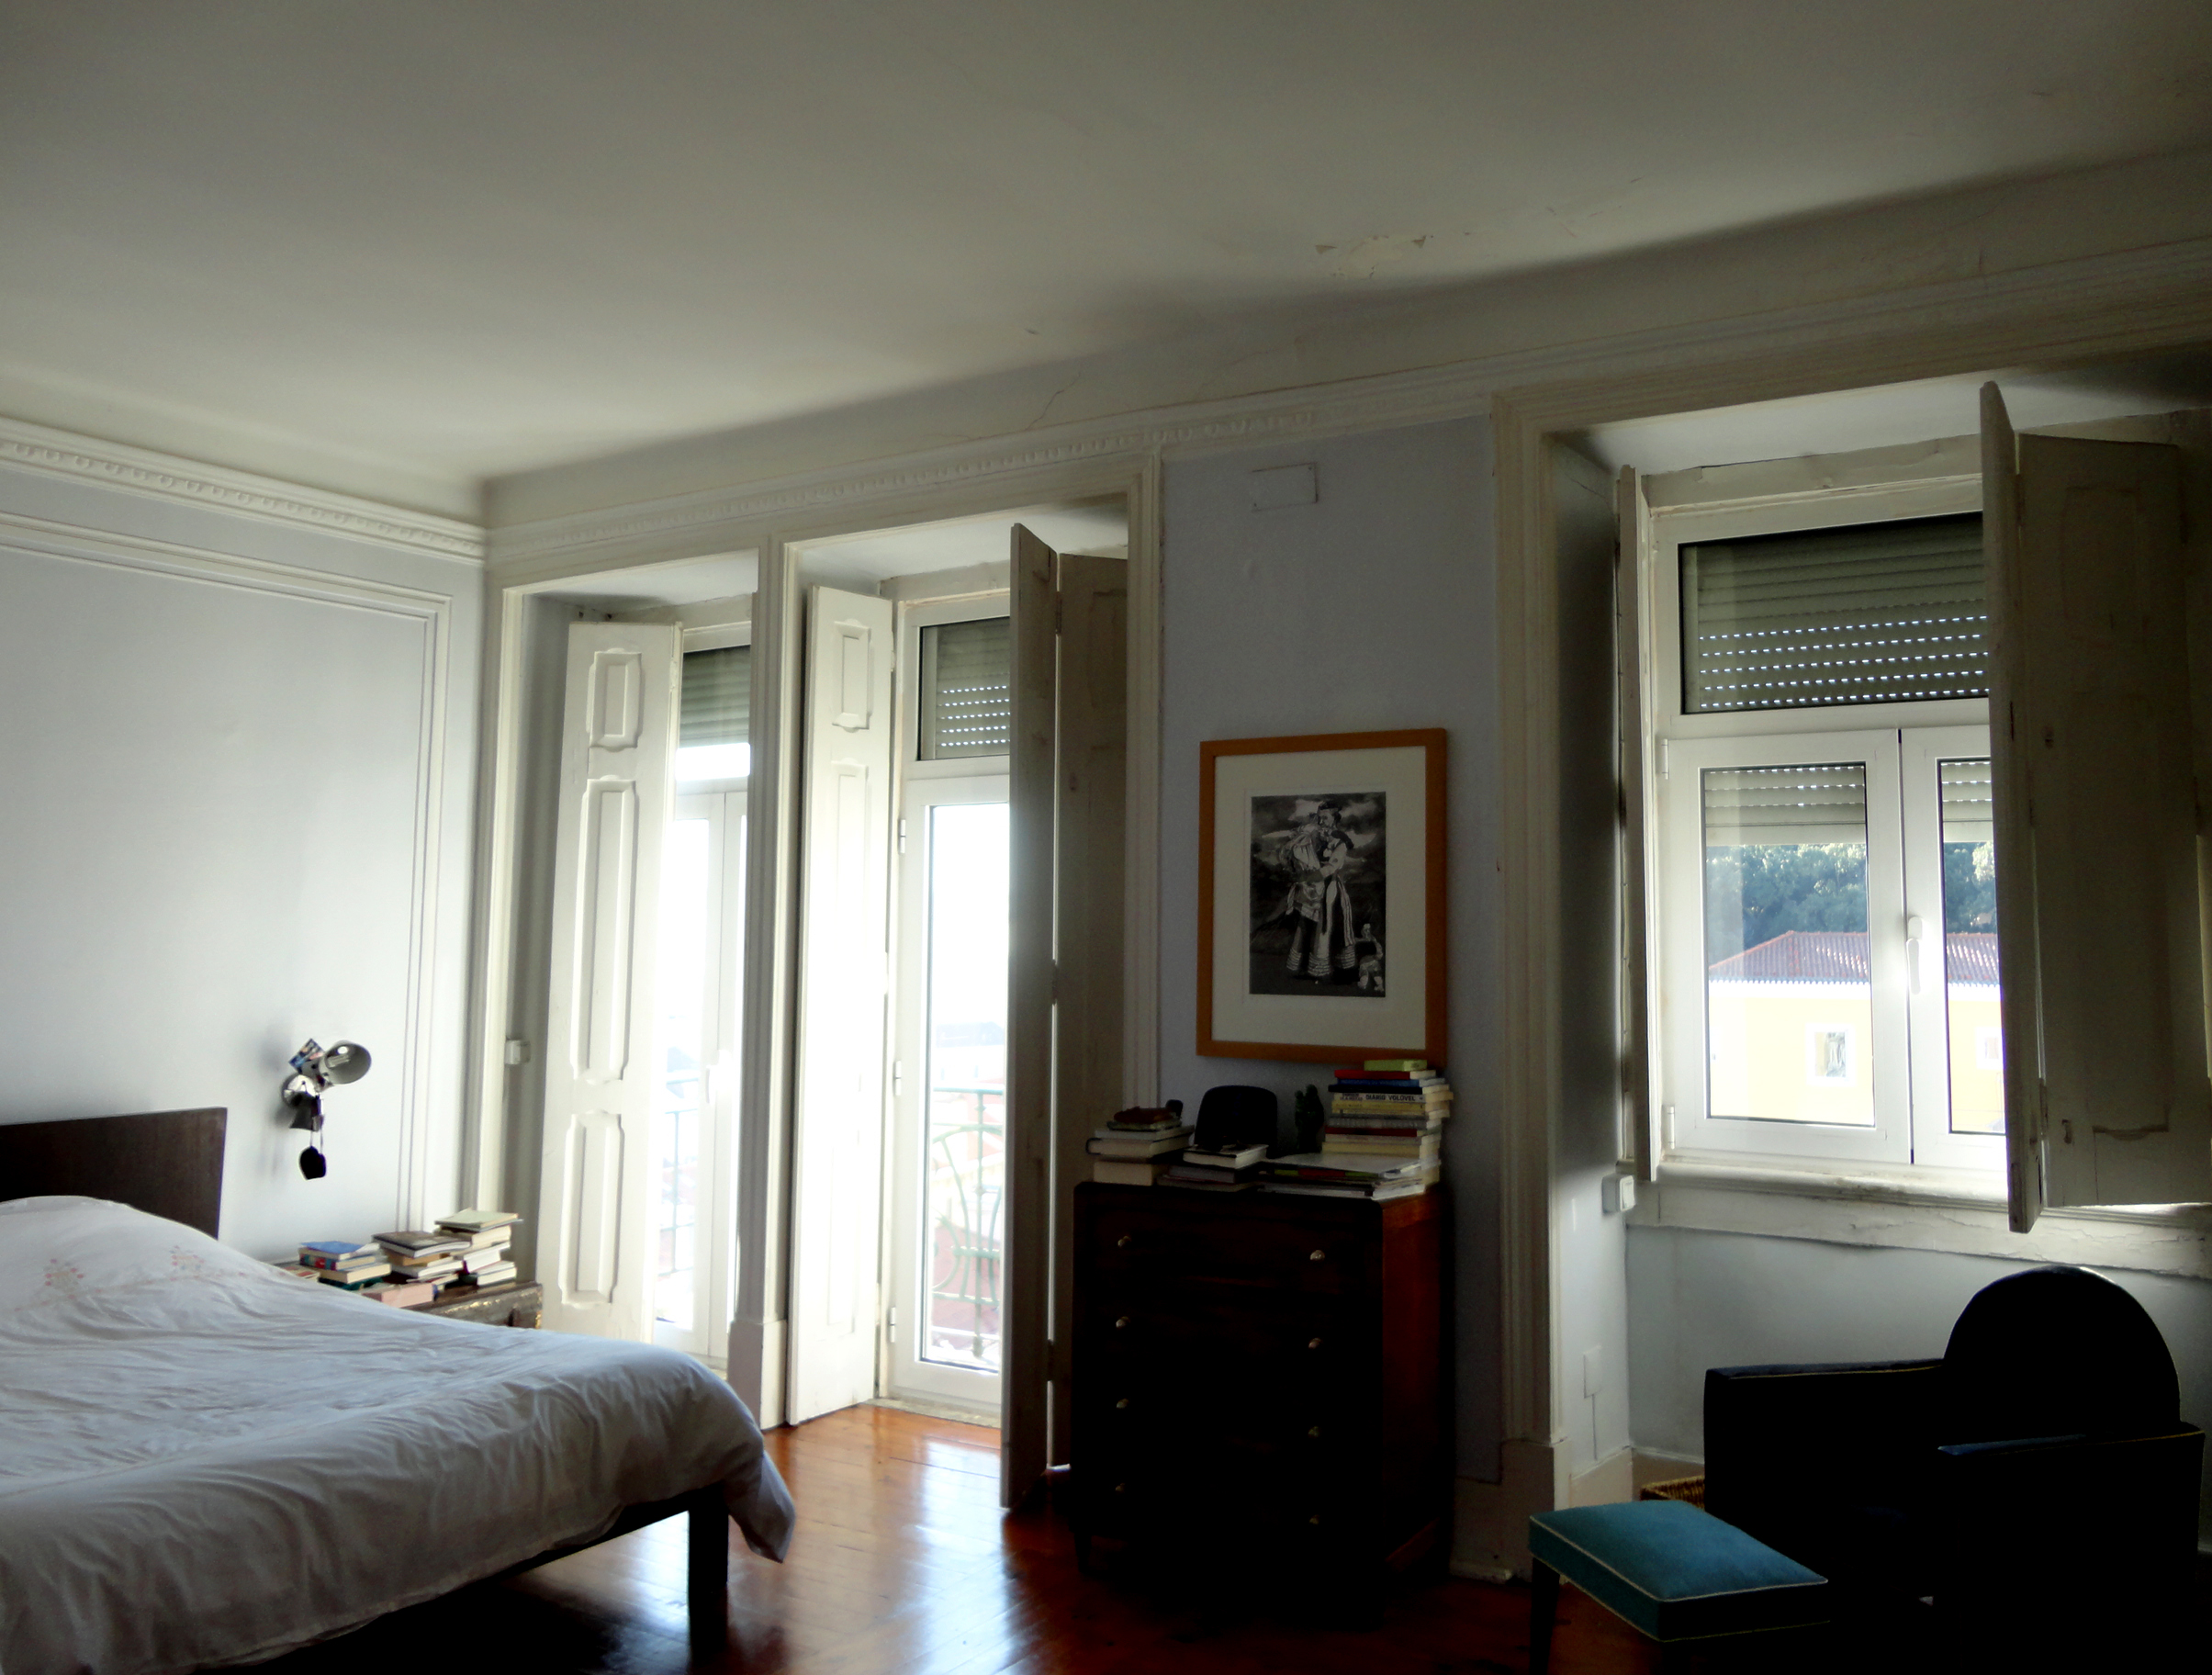 o quarto da serenidade